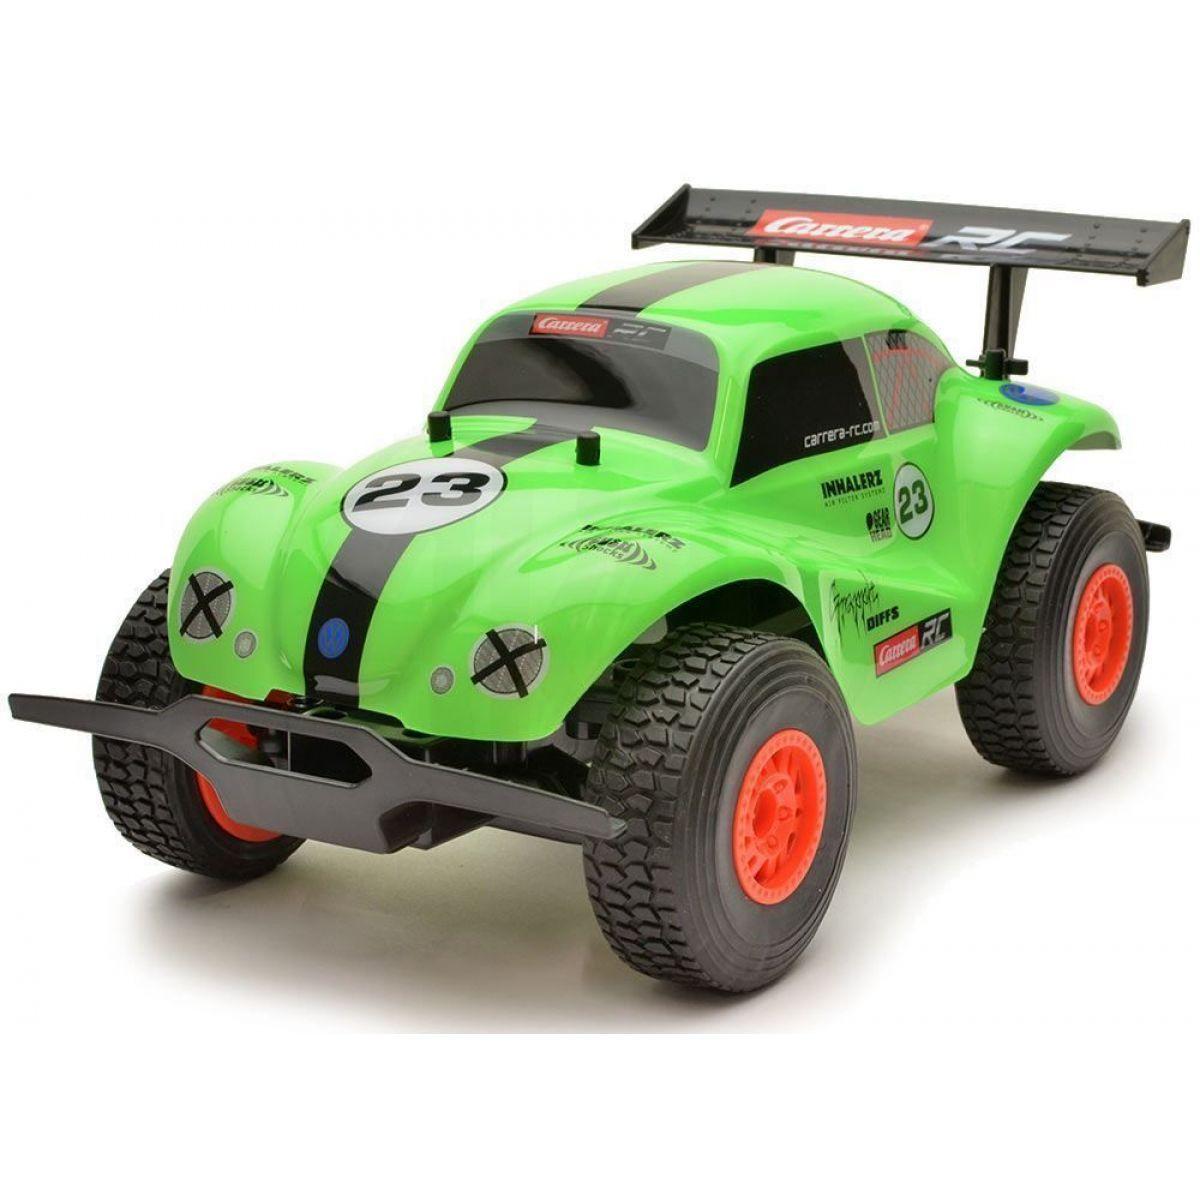 Carrera Rc Auto Vw Beetle 1 18 2 4ghz 4kids